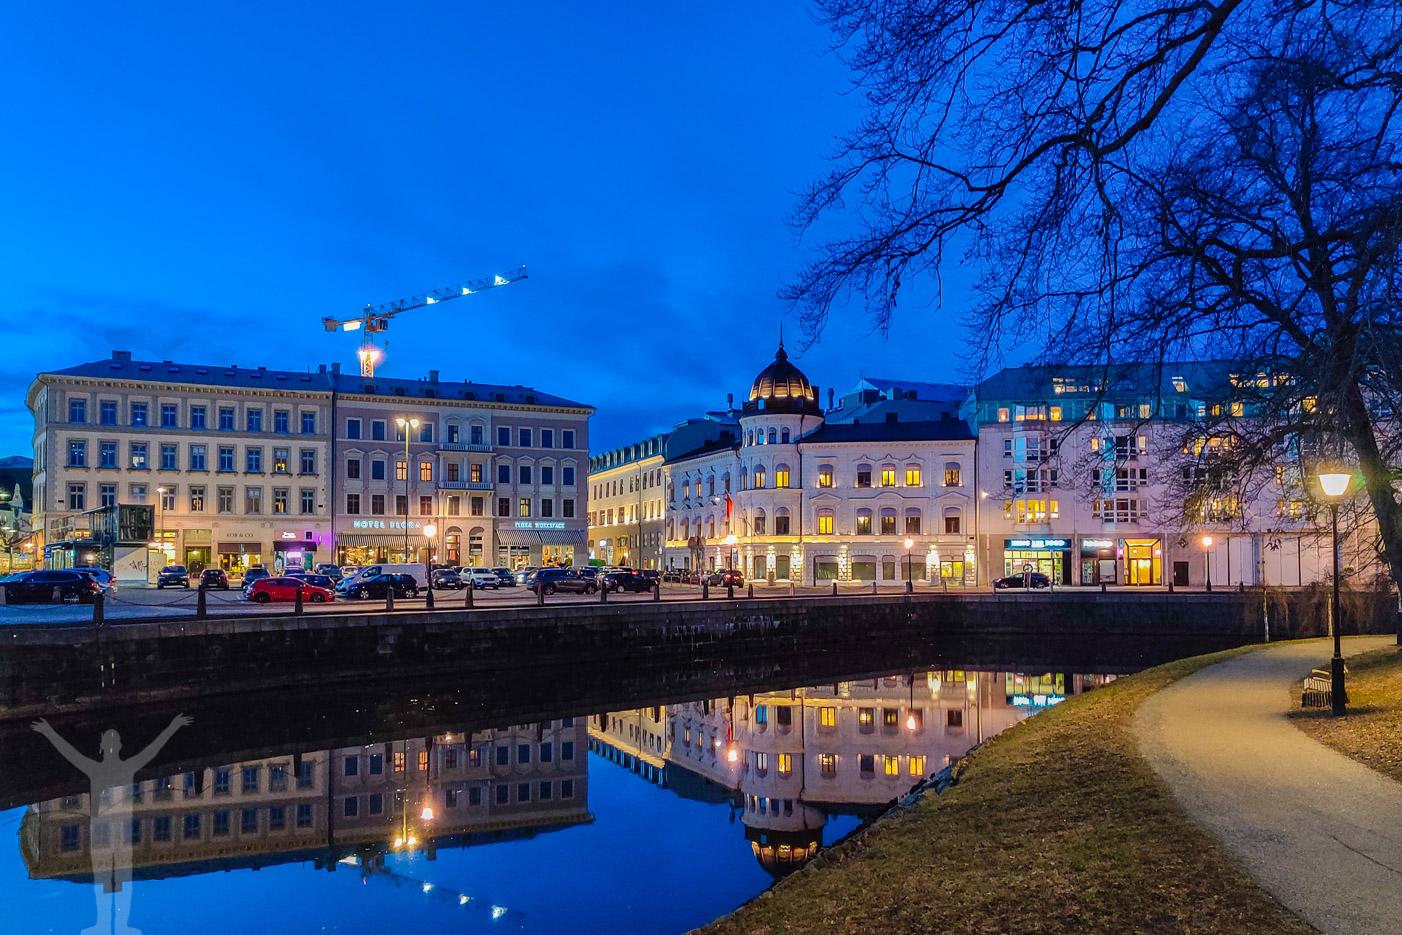 Hotel Flora i Göteborg